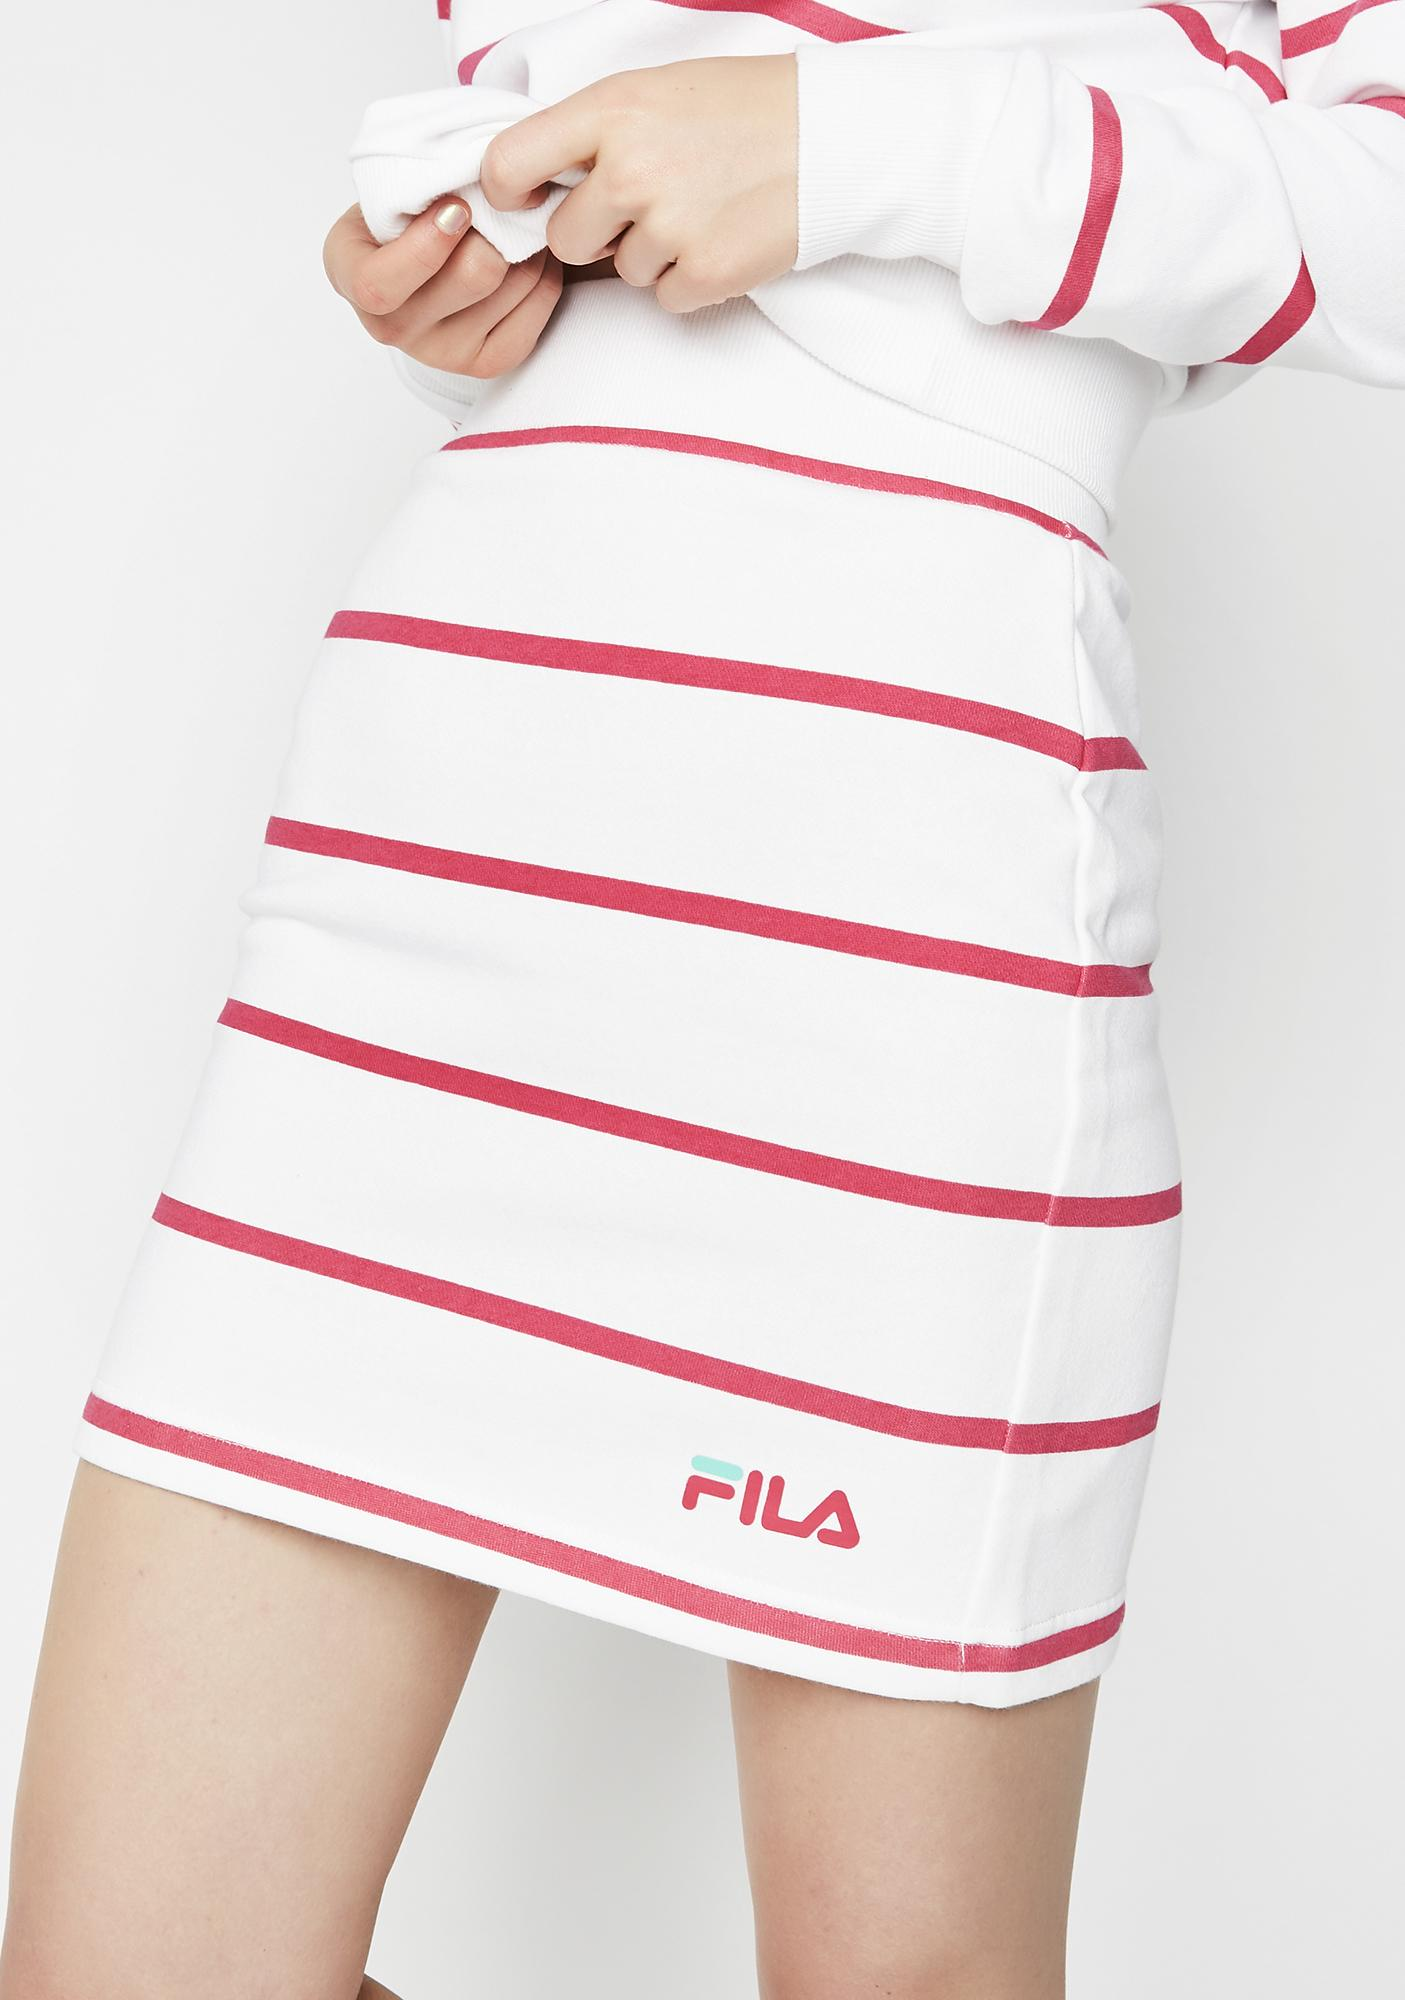 Fila Magenta Liri Striped Skirt